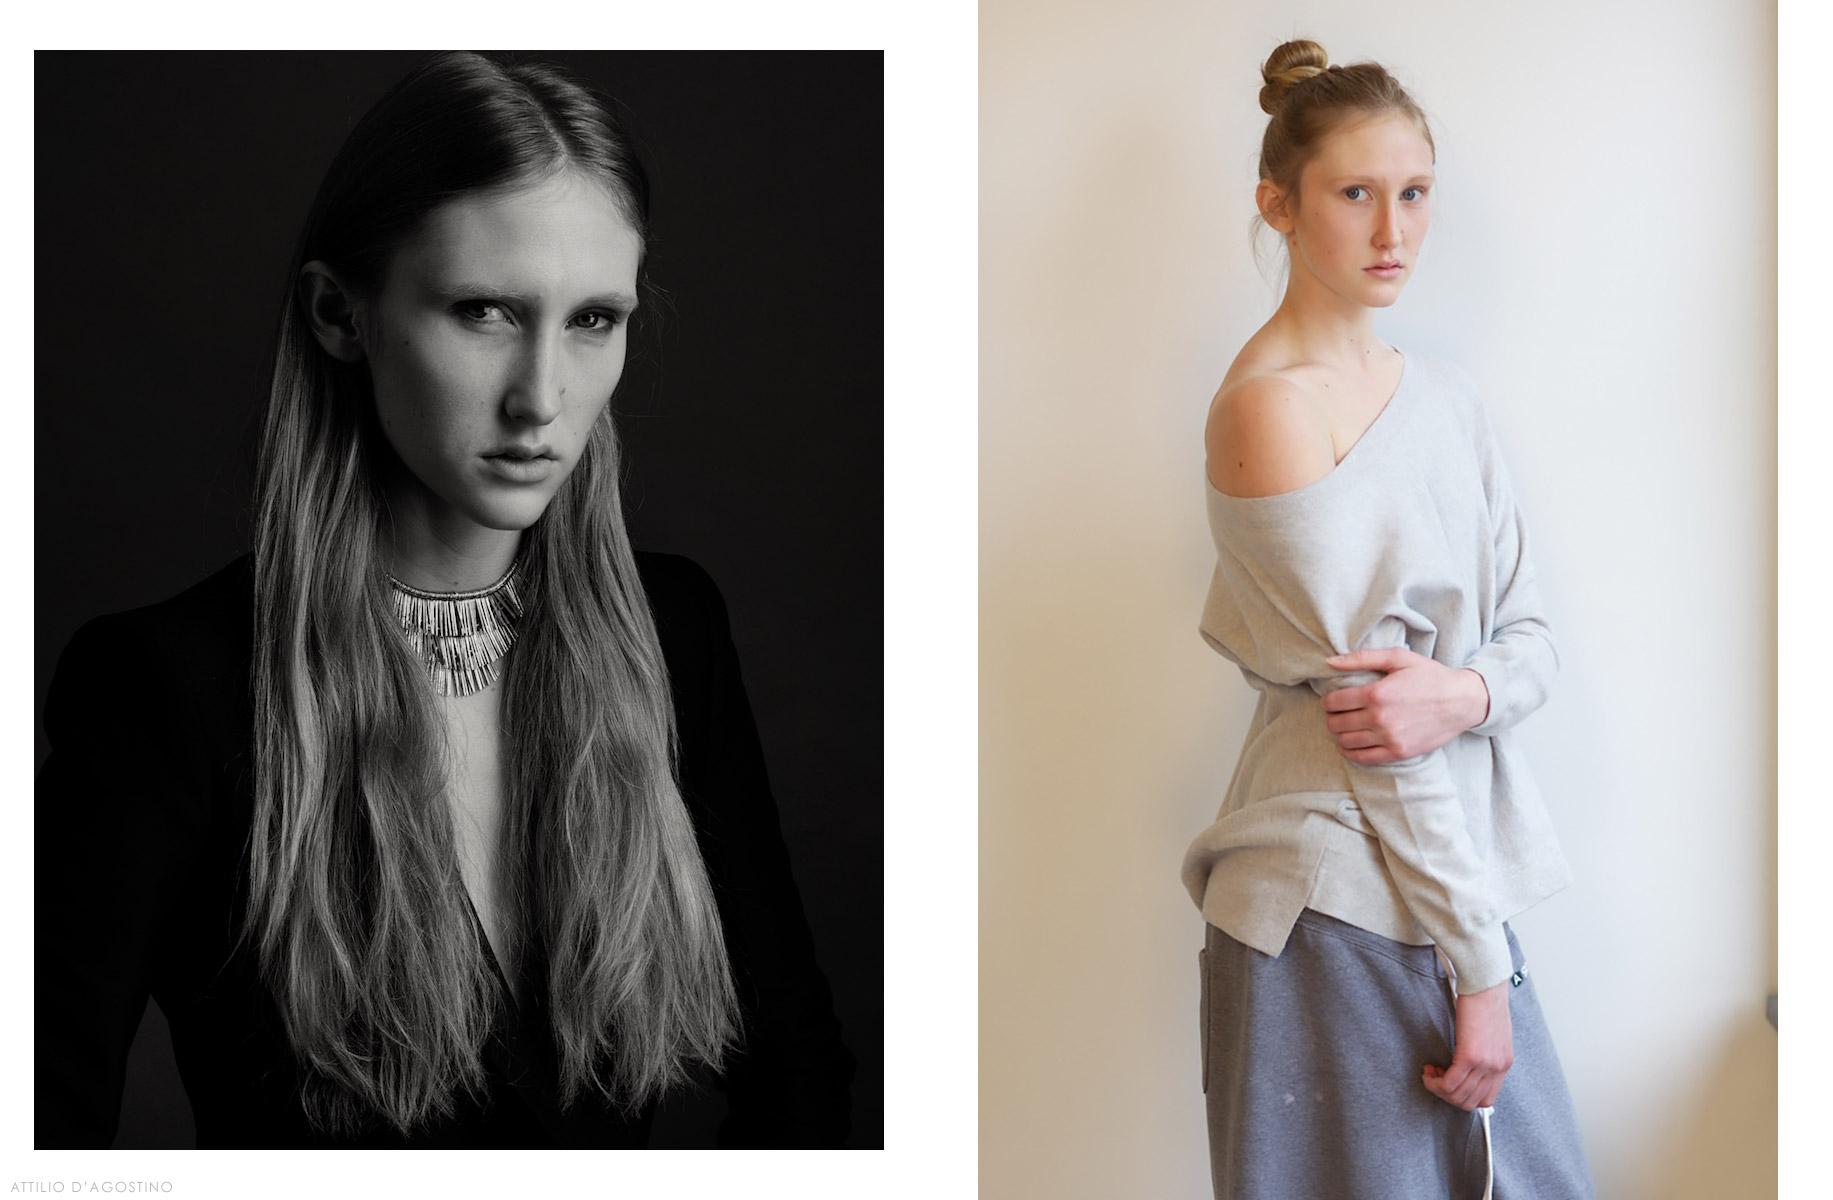 santa-fe-fashion-models-alexis-l.jpg